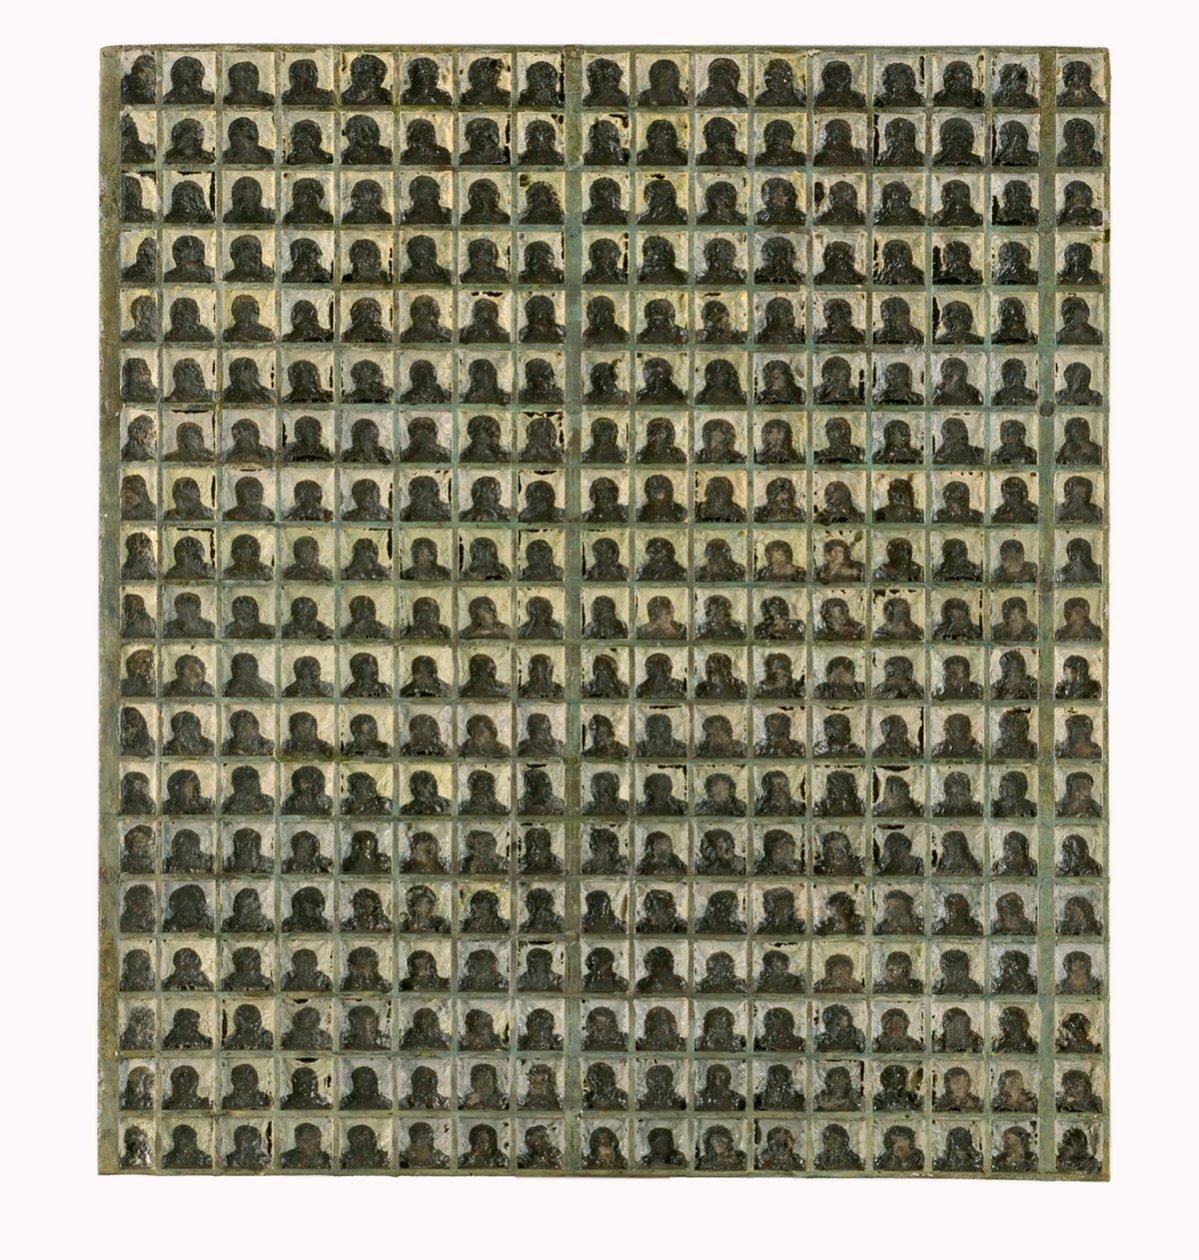 memoriel 5 setif guelma kherrata oeuvre artiste contemporain Kamel Yahiaoui